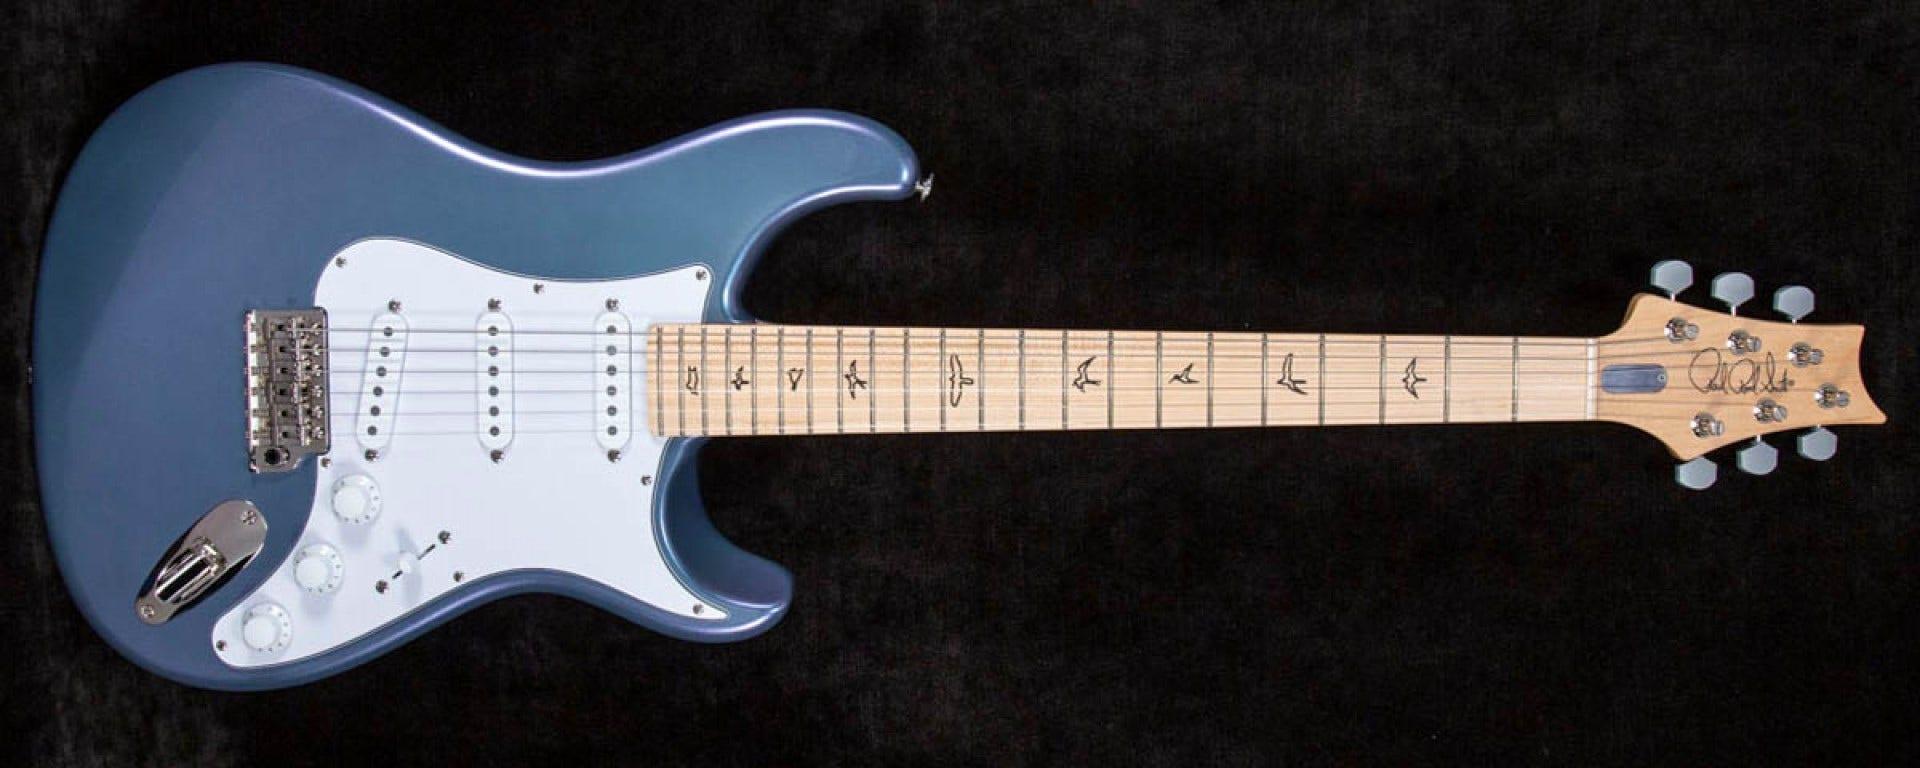 Sam Ash Guitar of Distinction Inspection: PRS John Mayer Silver Sky (Lunar Ice)